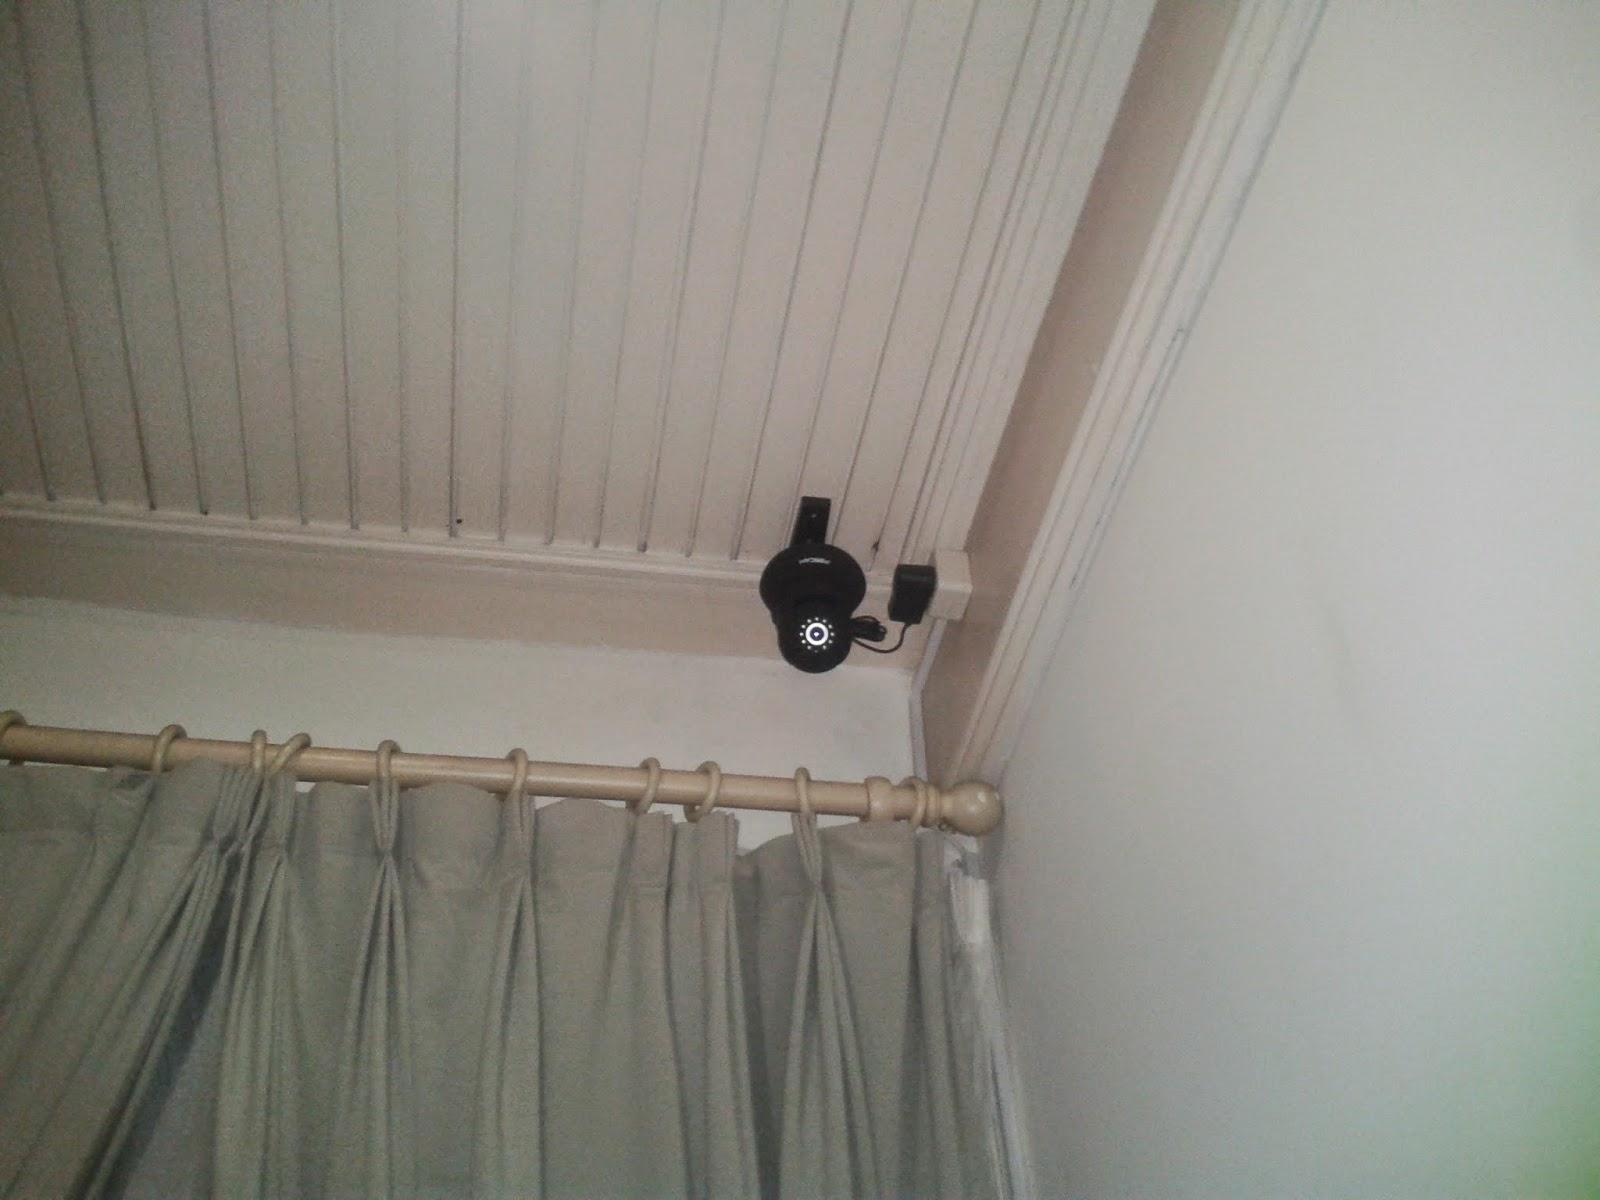 IPcam Foscam